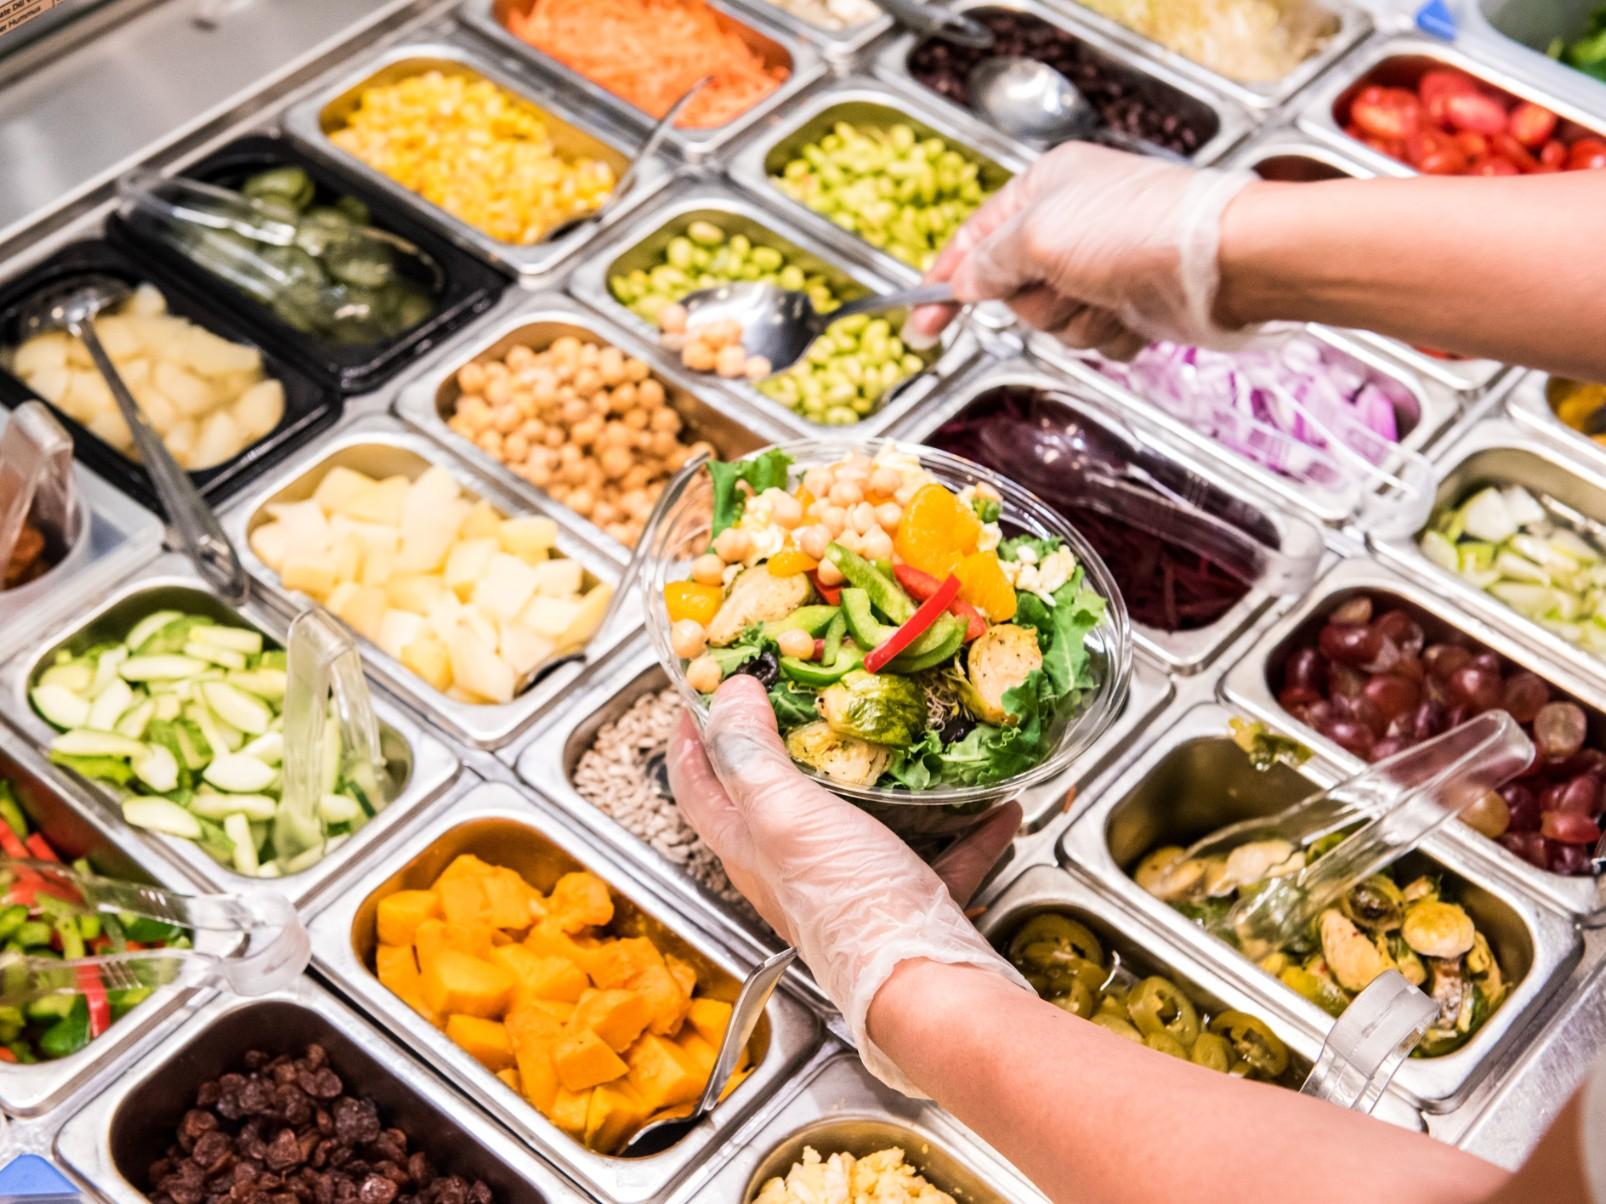 SaladStop! (DUO Galleria) - Dine, Shop, Earn